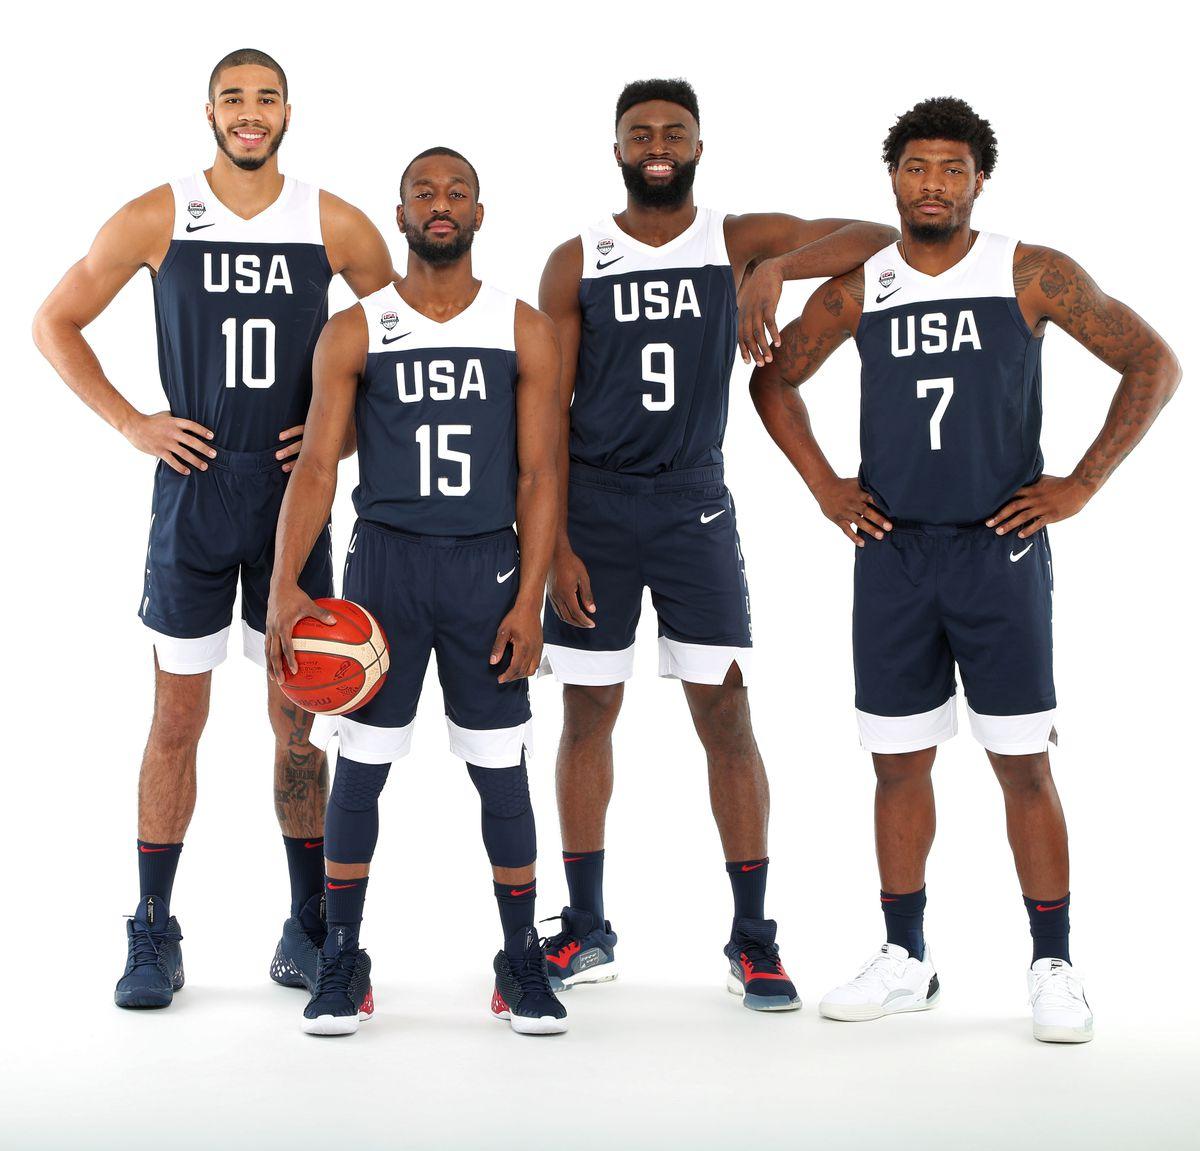 2019 USA Basketball Men's National Team - Portraits